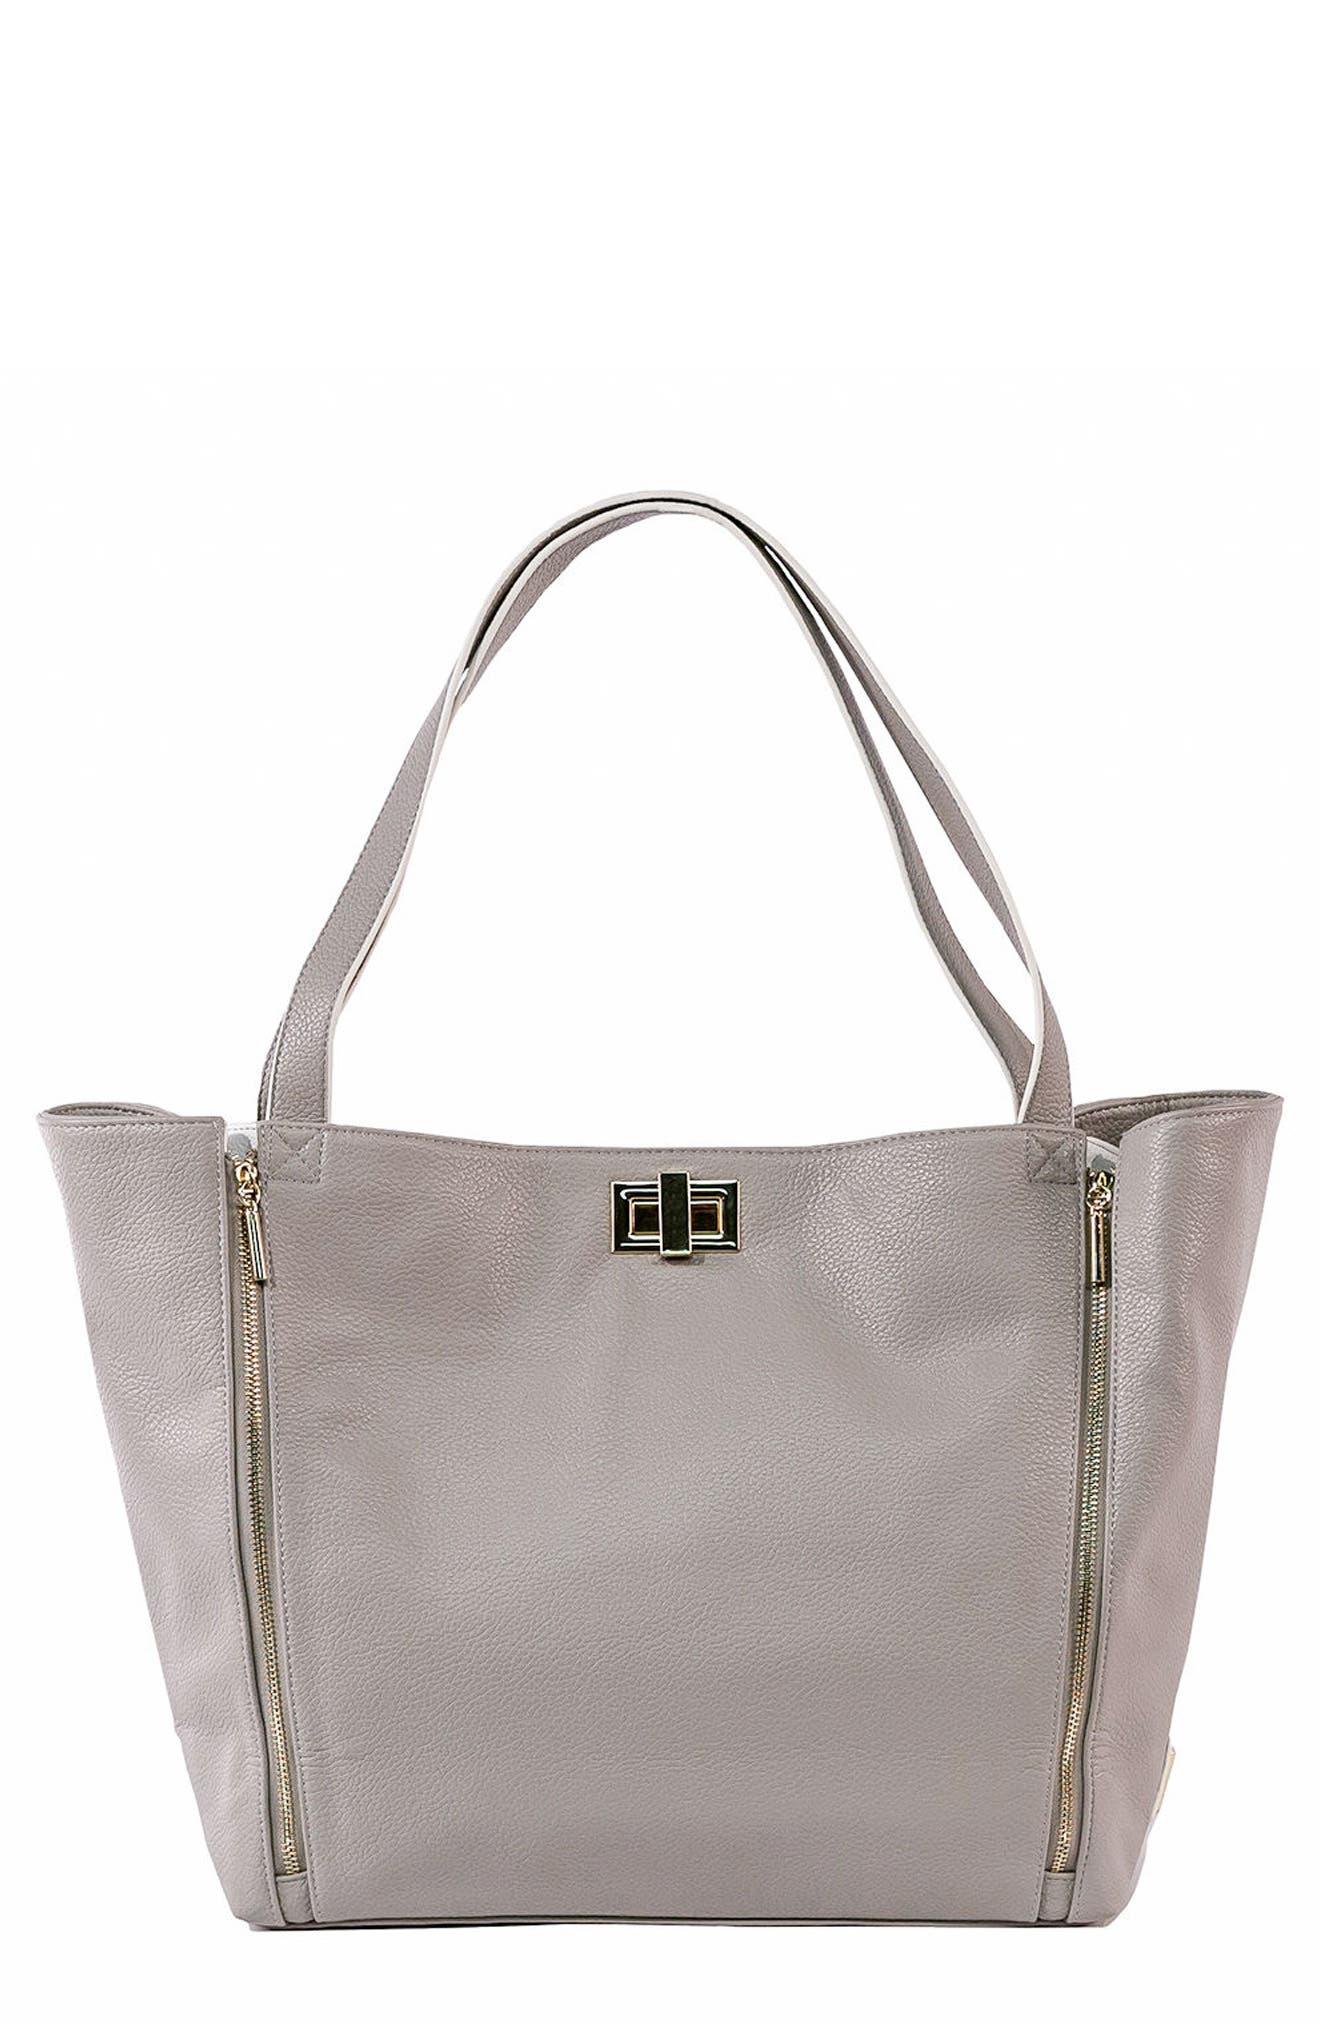 Sloane Diaper Bag,                         Main,                         color, Neutral/ White